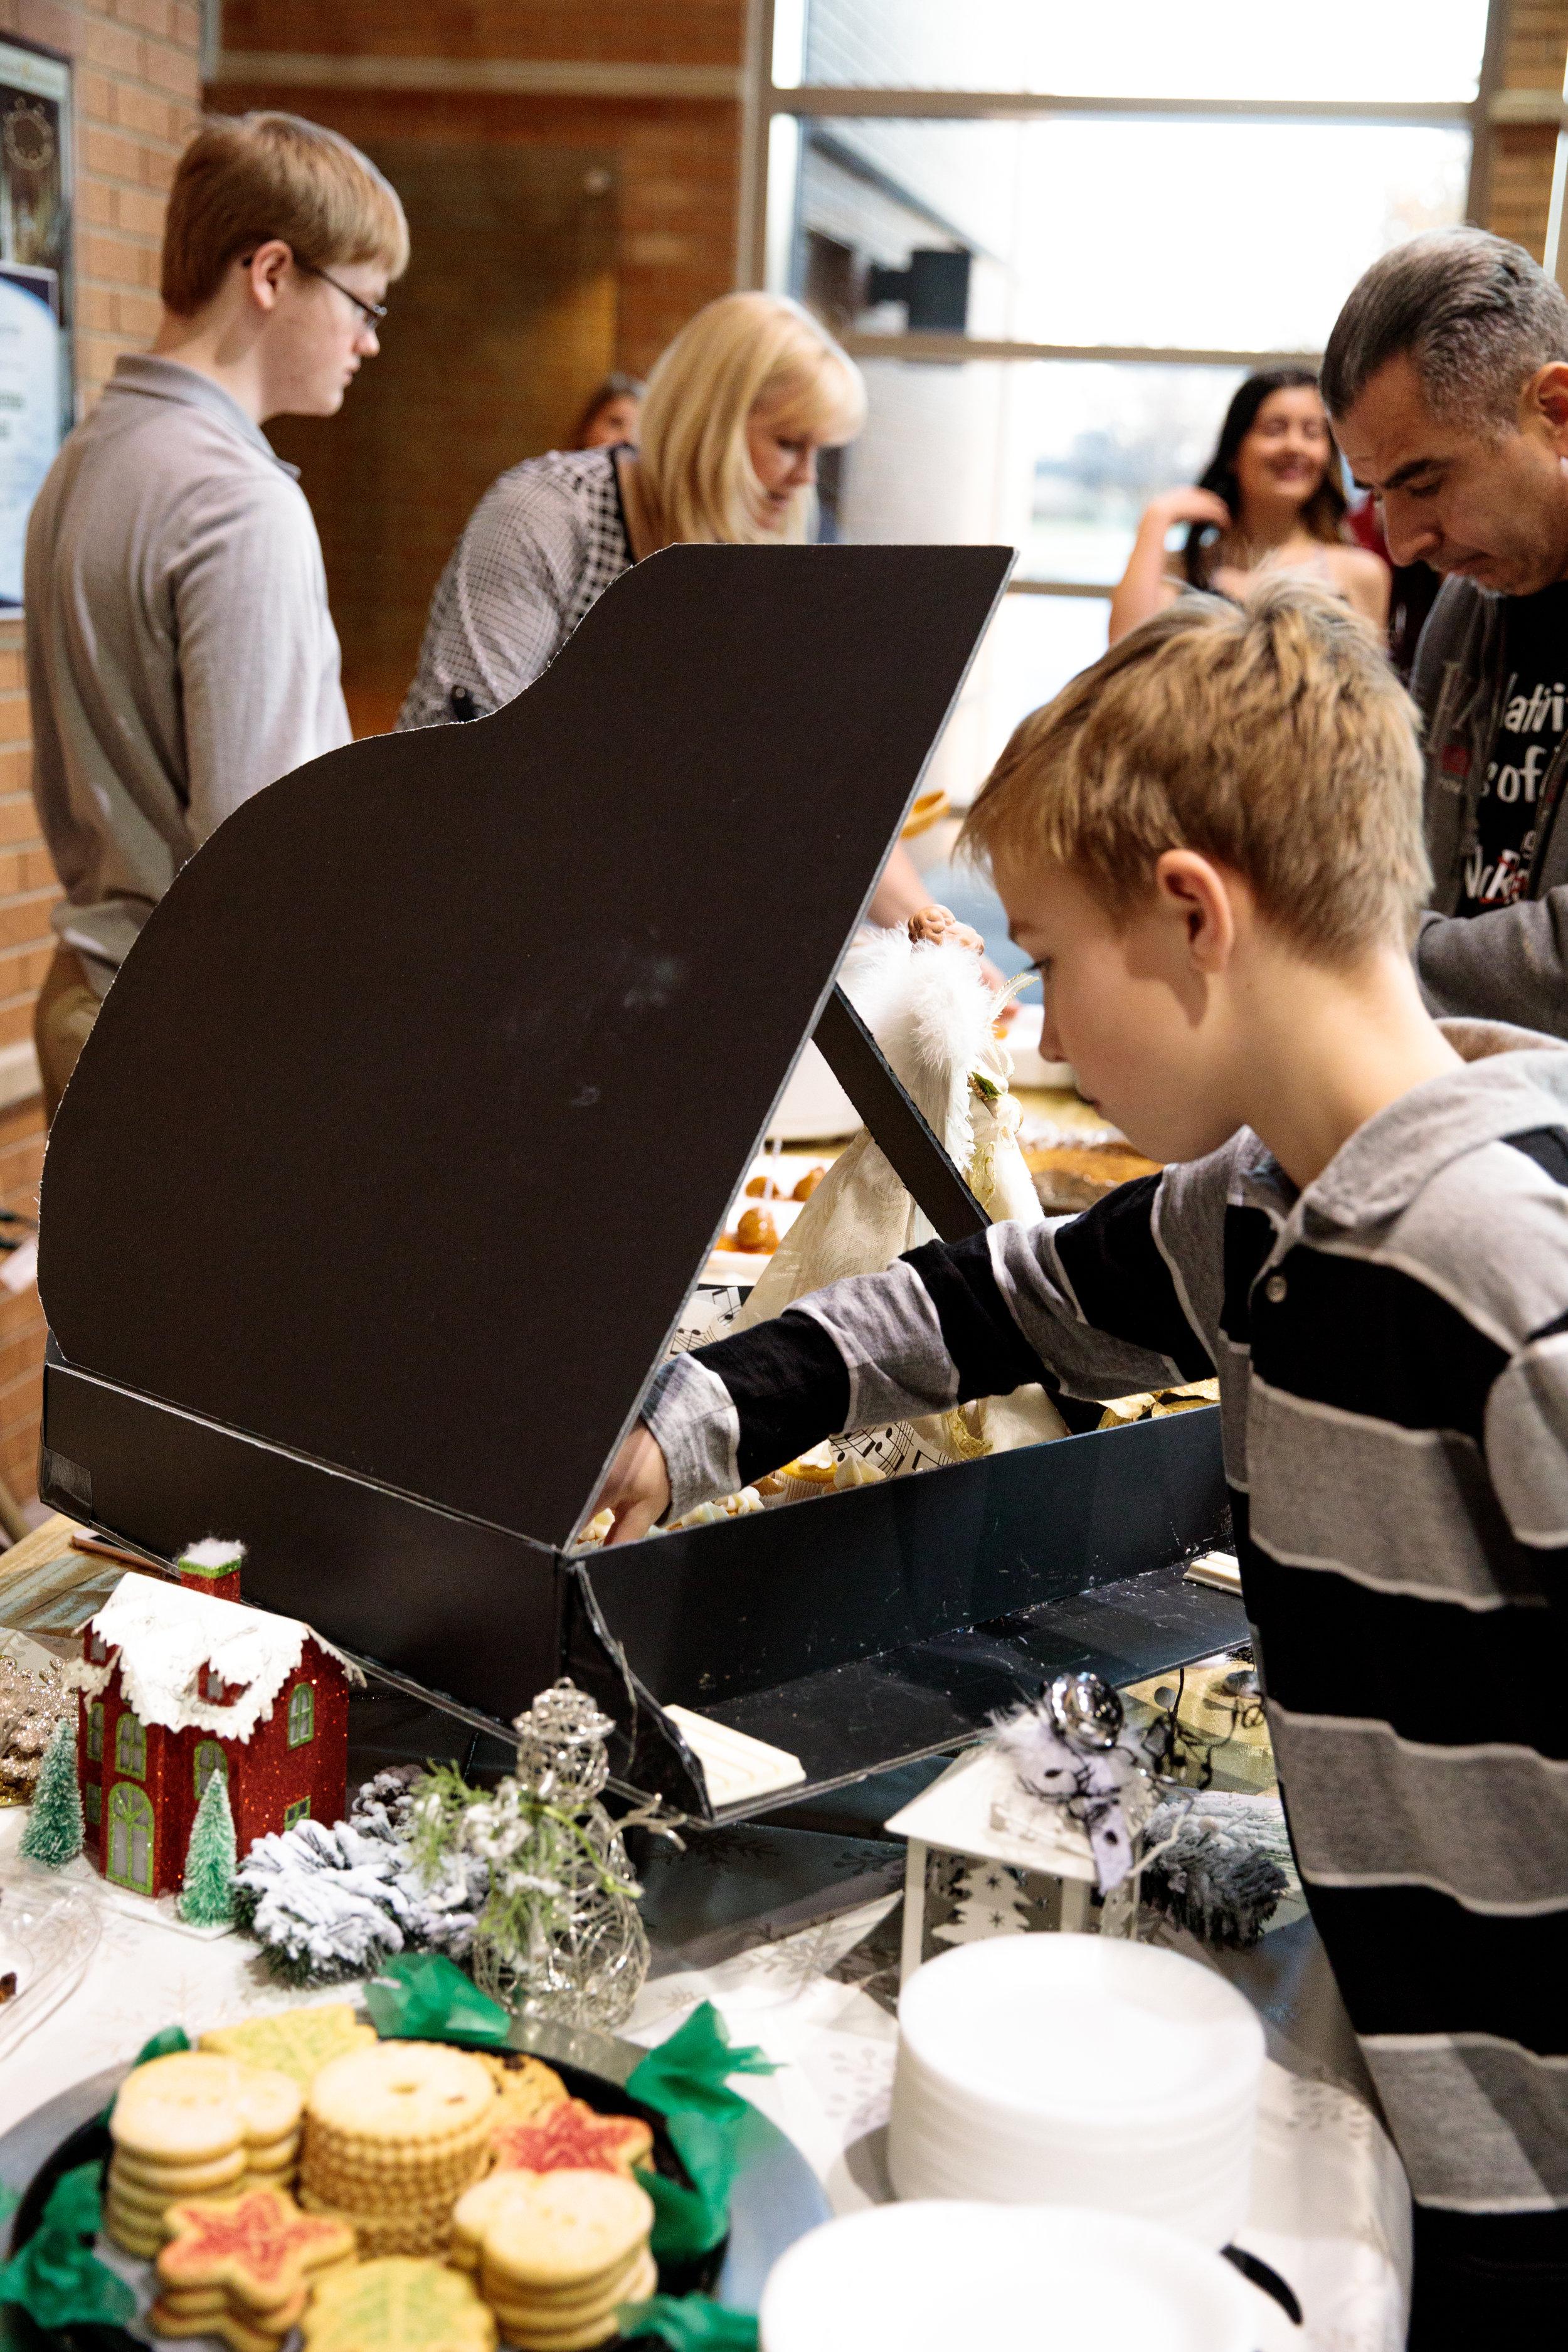 kid taking cupcake from piano-1.JPG